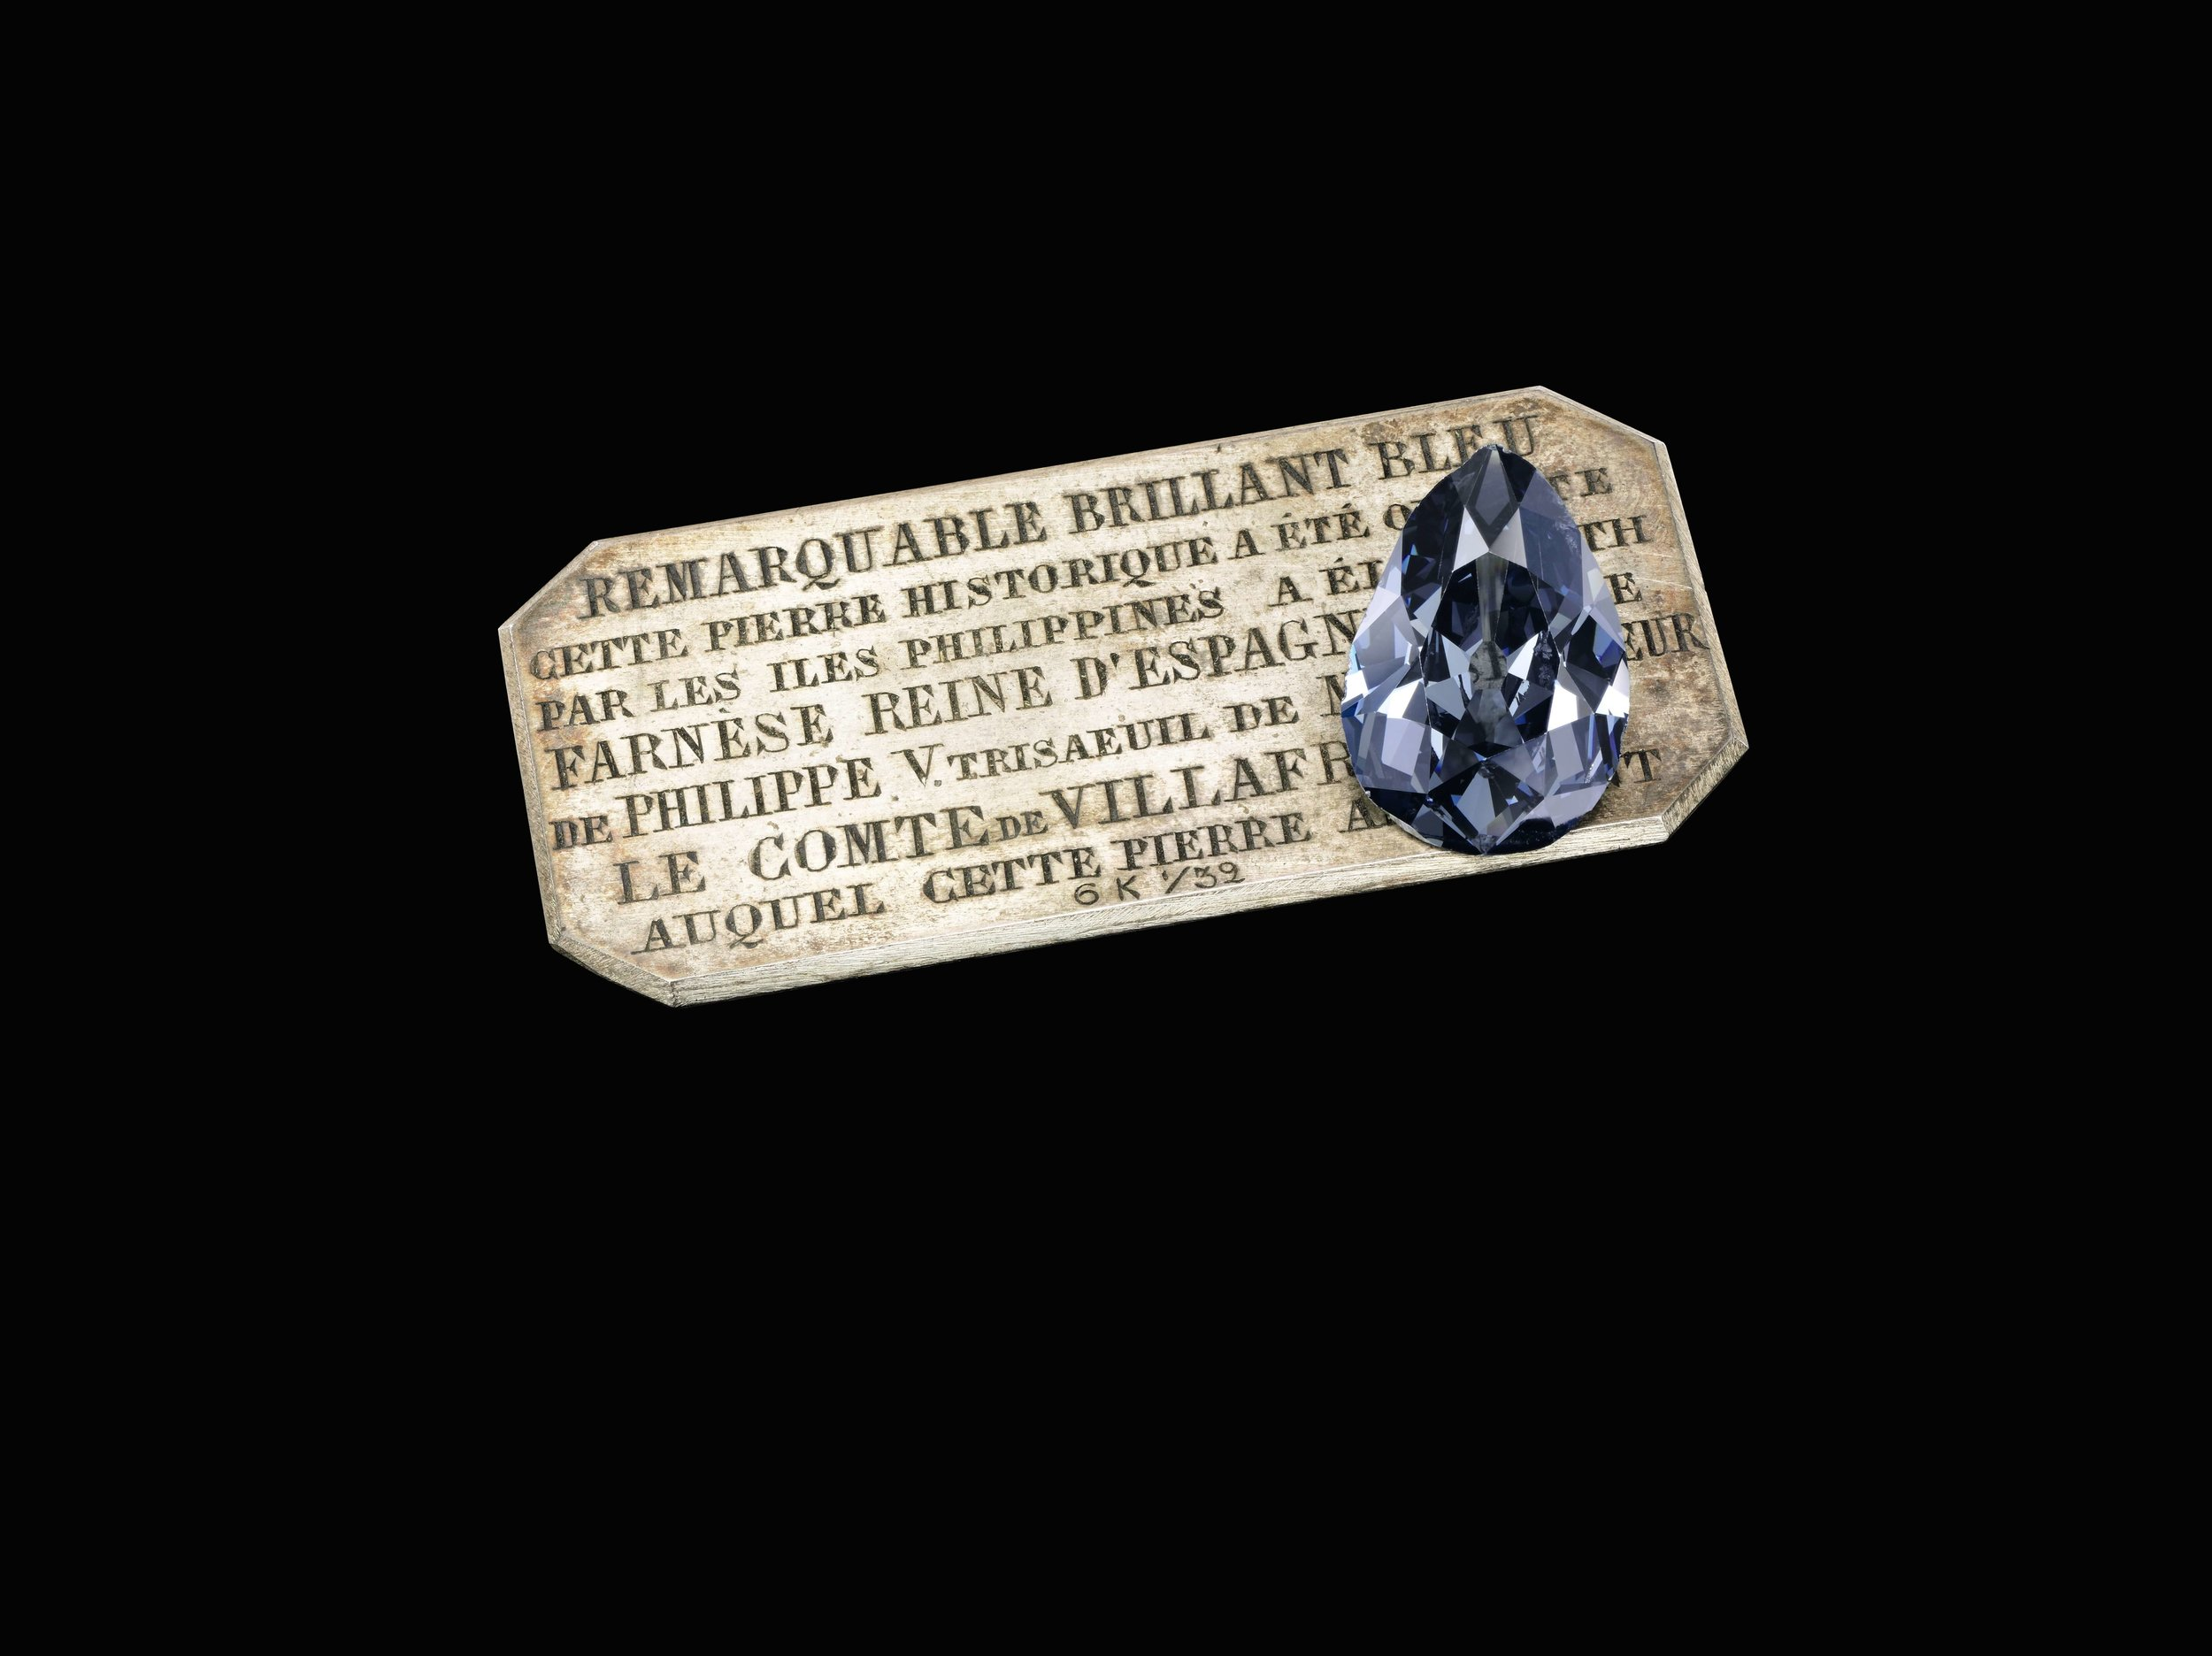 Sothebys-blue-farmese-couturenotebook